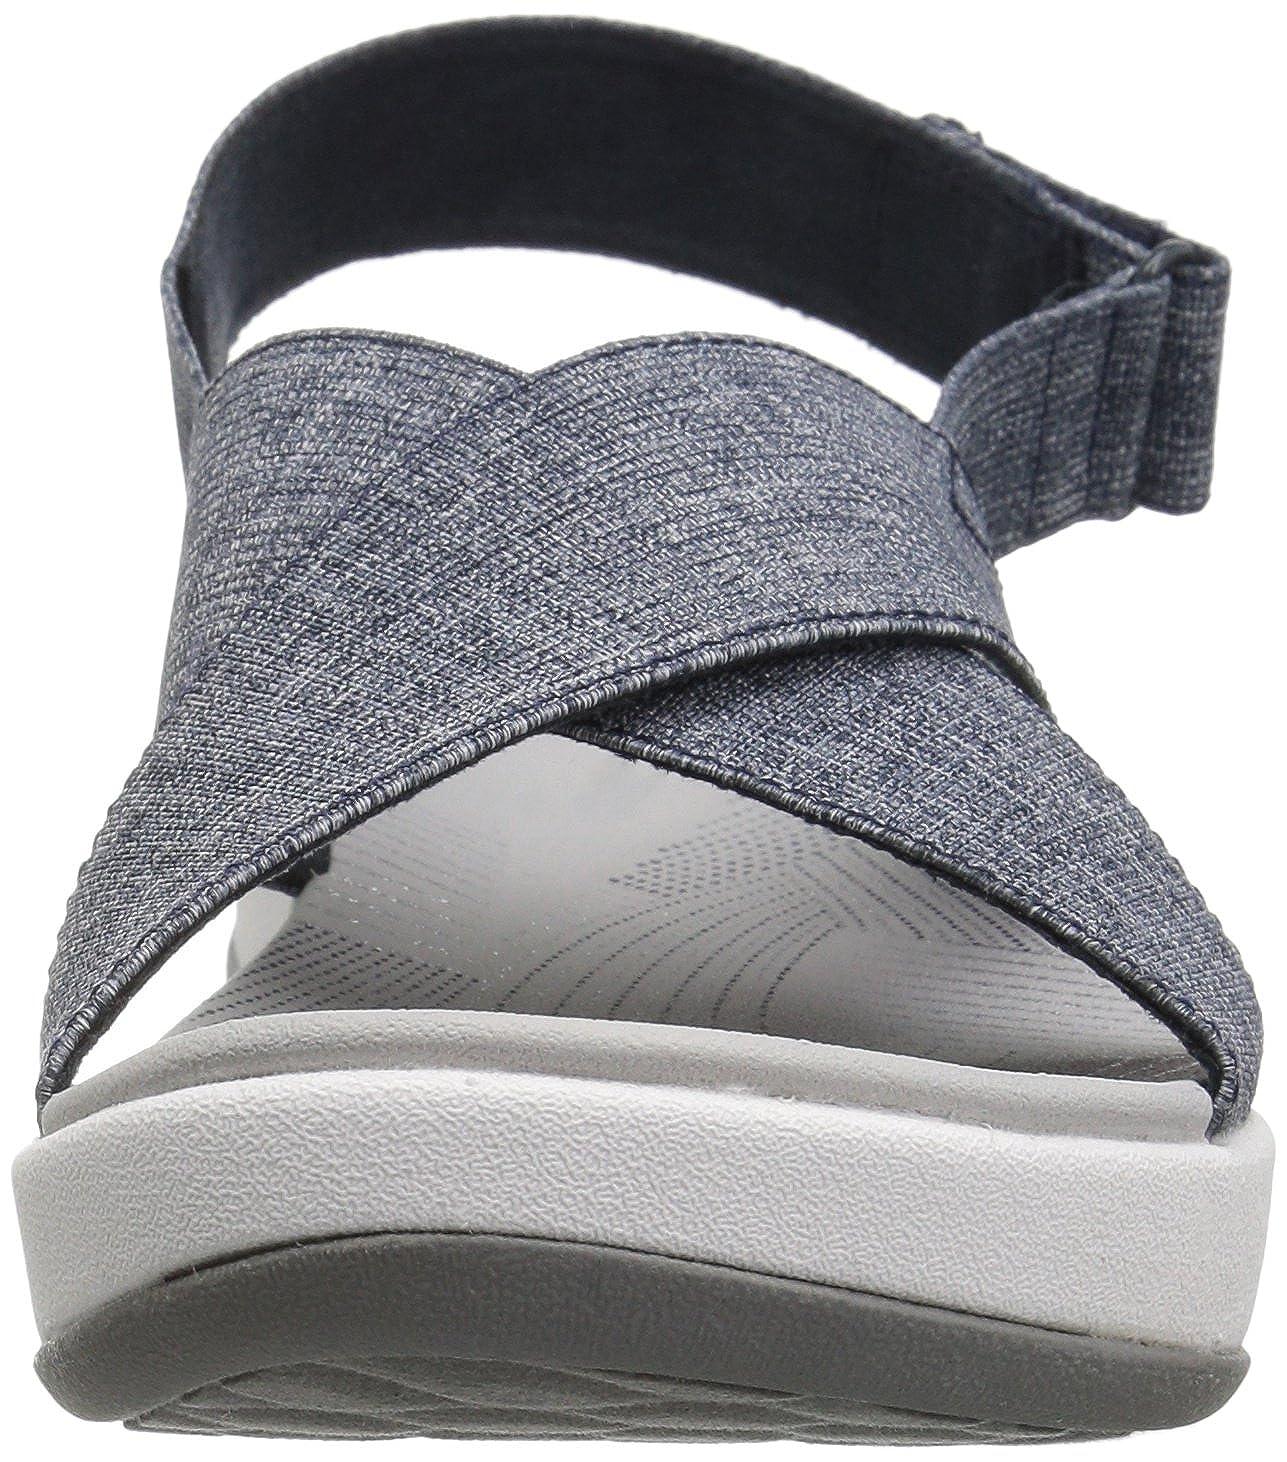 CLARKS CLARKS Women's Arla Kaydin Sandal, Black Elastic Fabric, 6.5 Wide US from Amazon | more